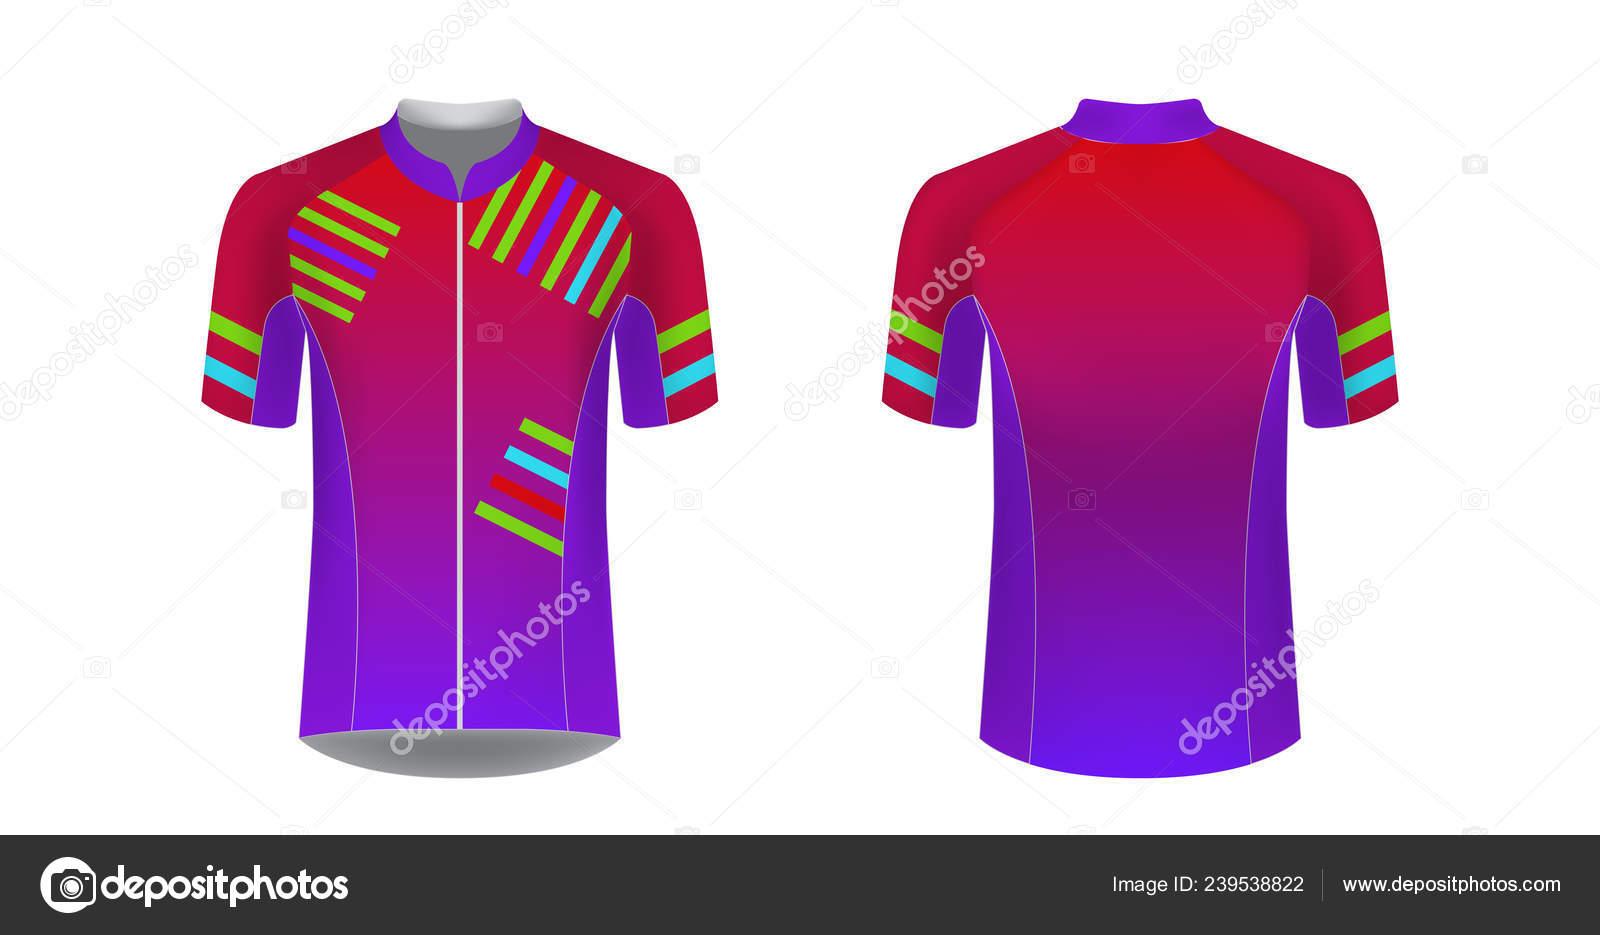 790a0168a Sportswear Templates Designs Sublimation Printing Uniform Blank Triathlon  Cycling Cross — Stock Vector